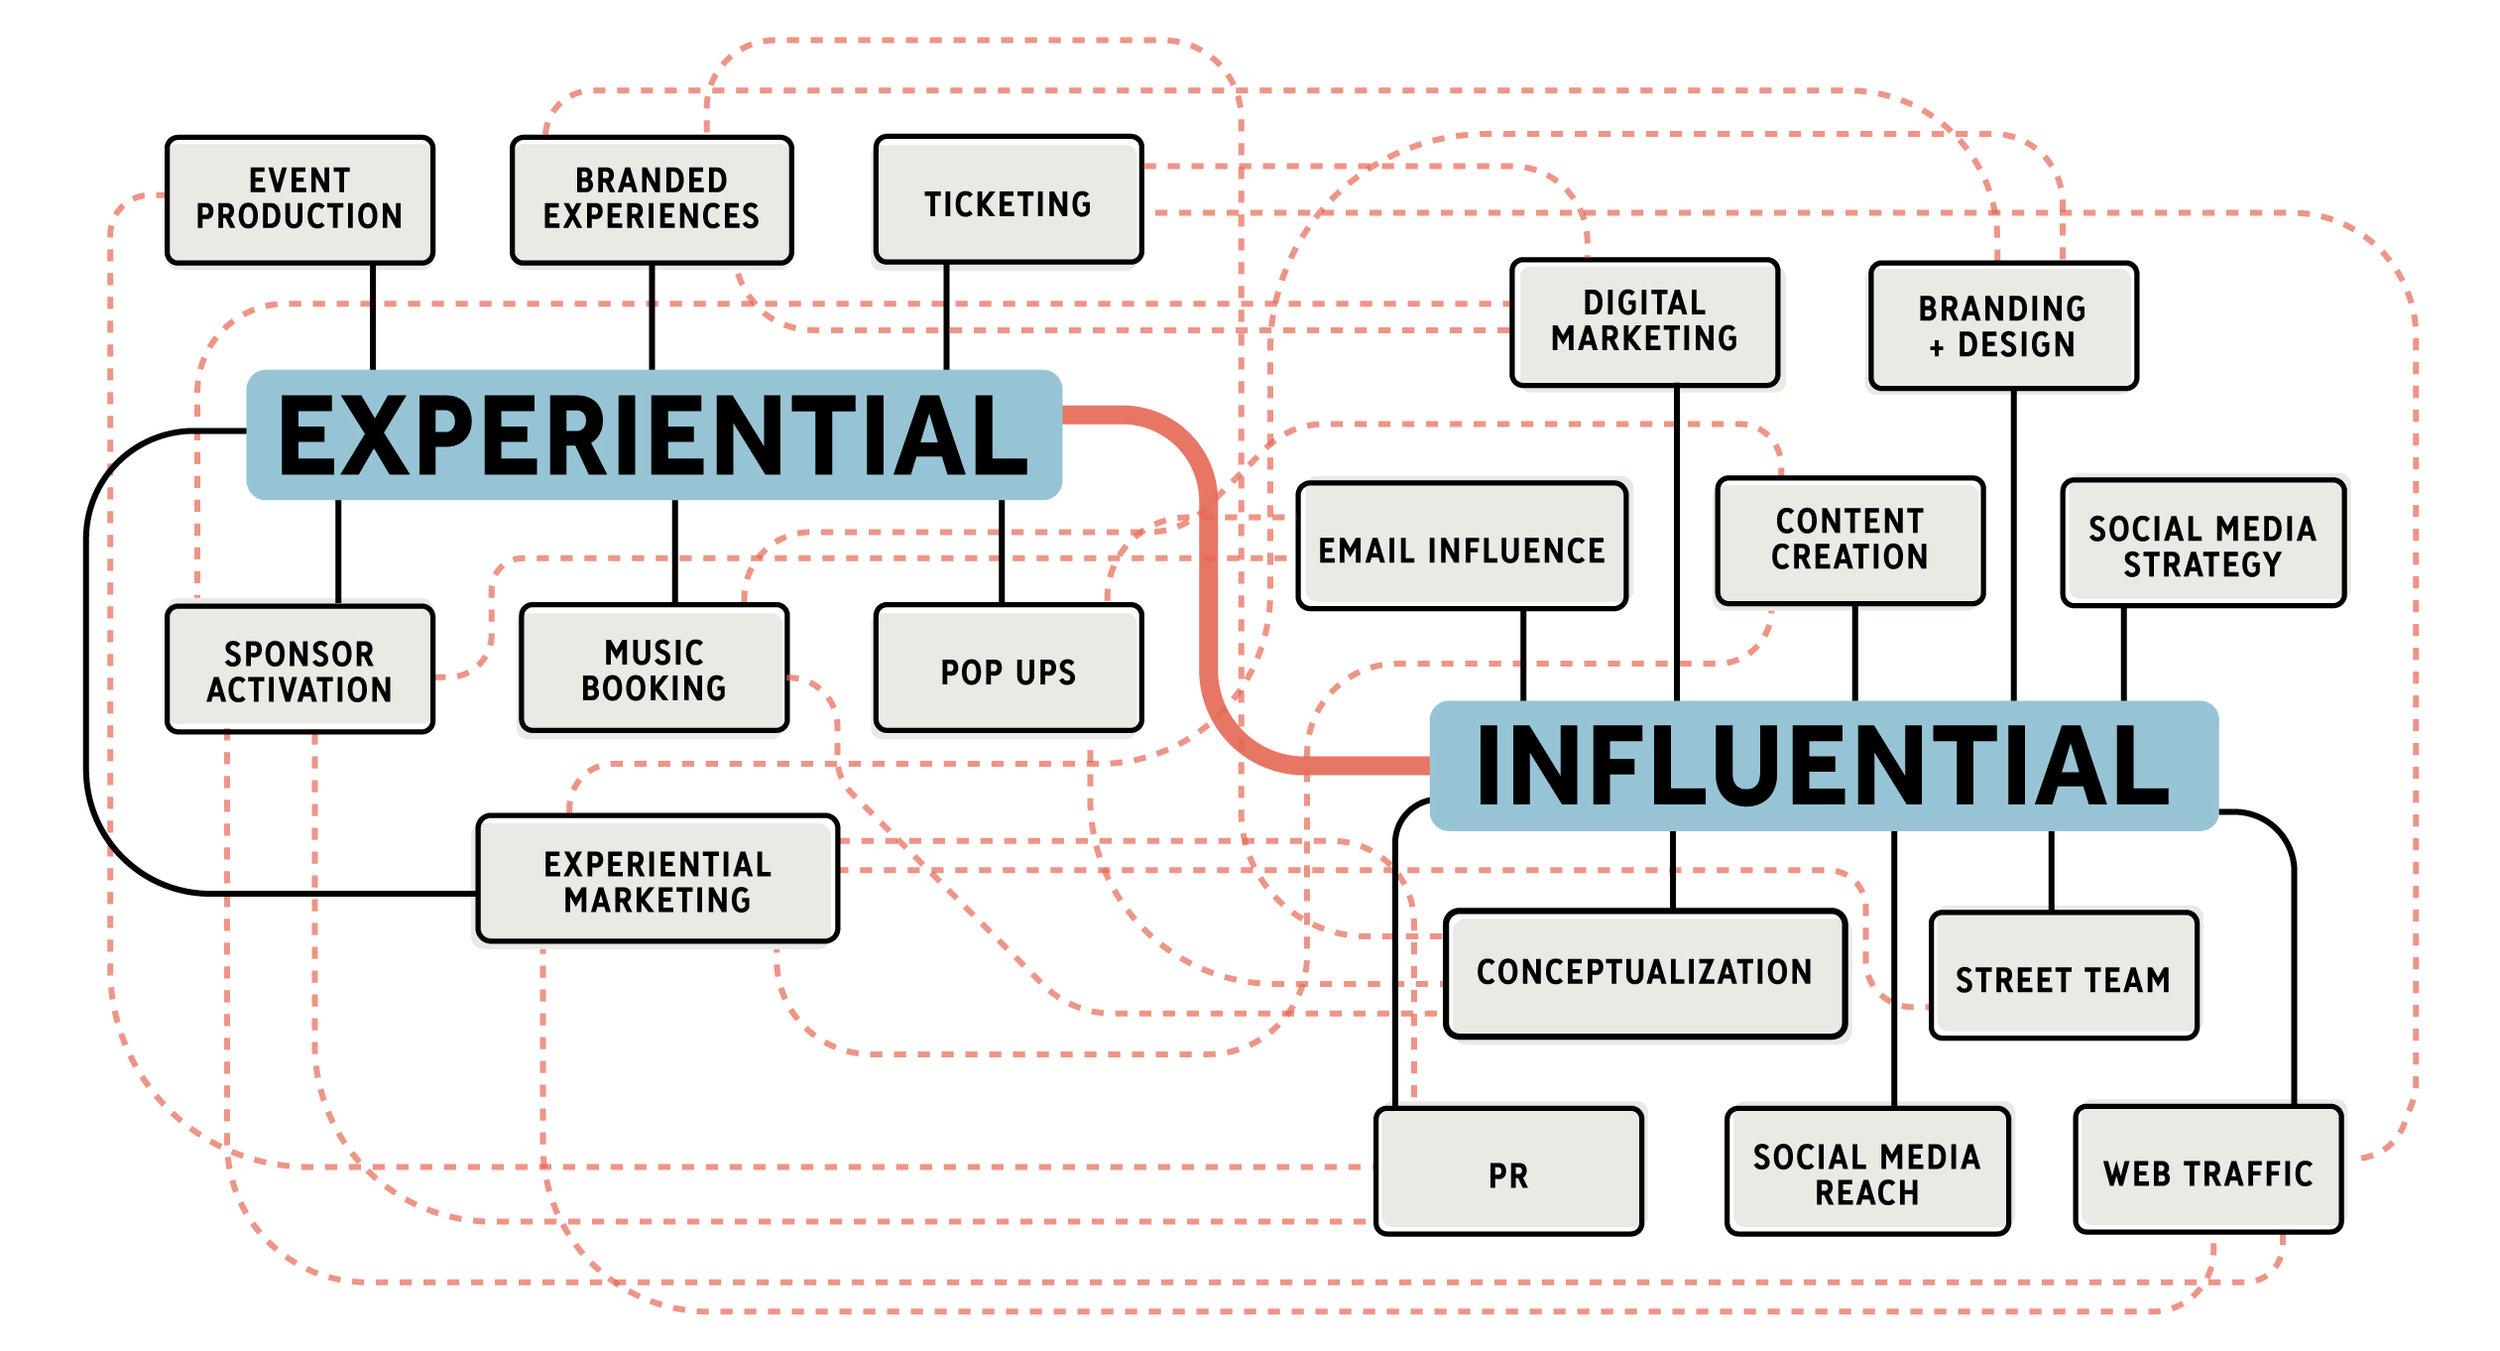 19_agencysite_services-chart2.jpg